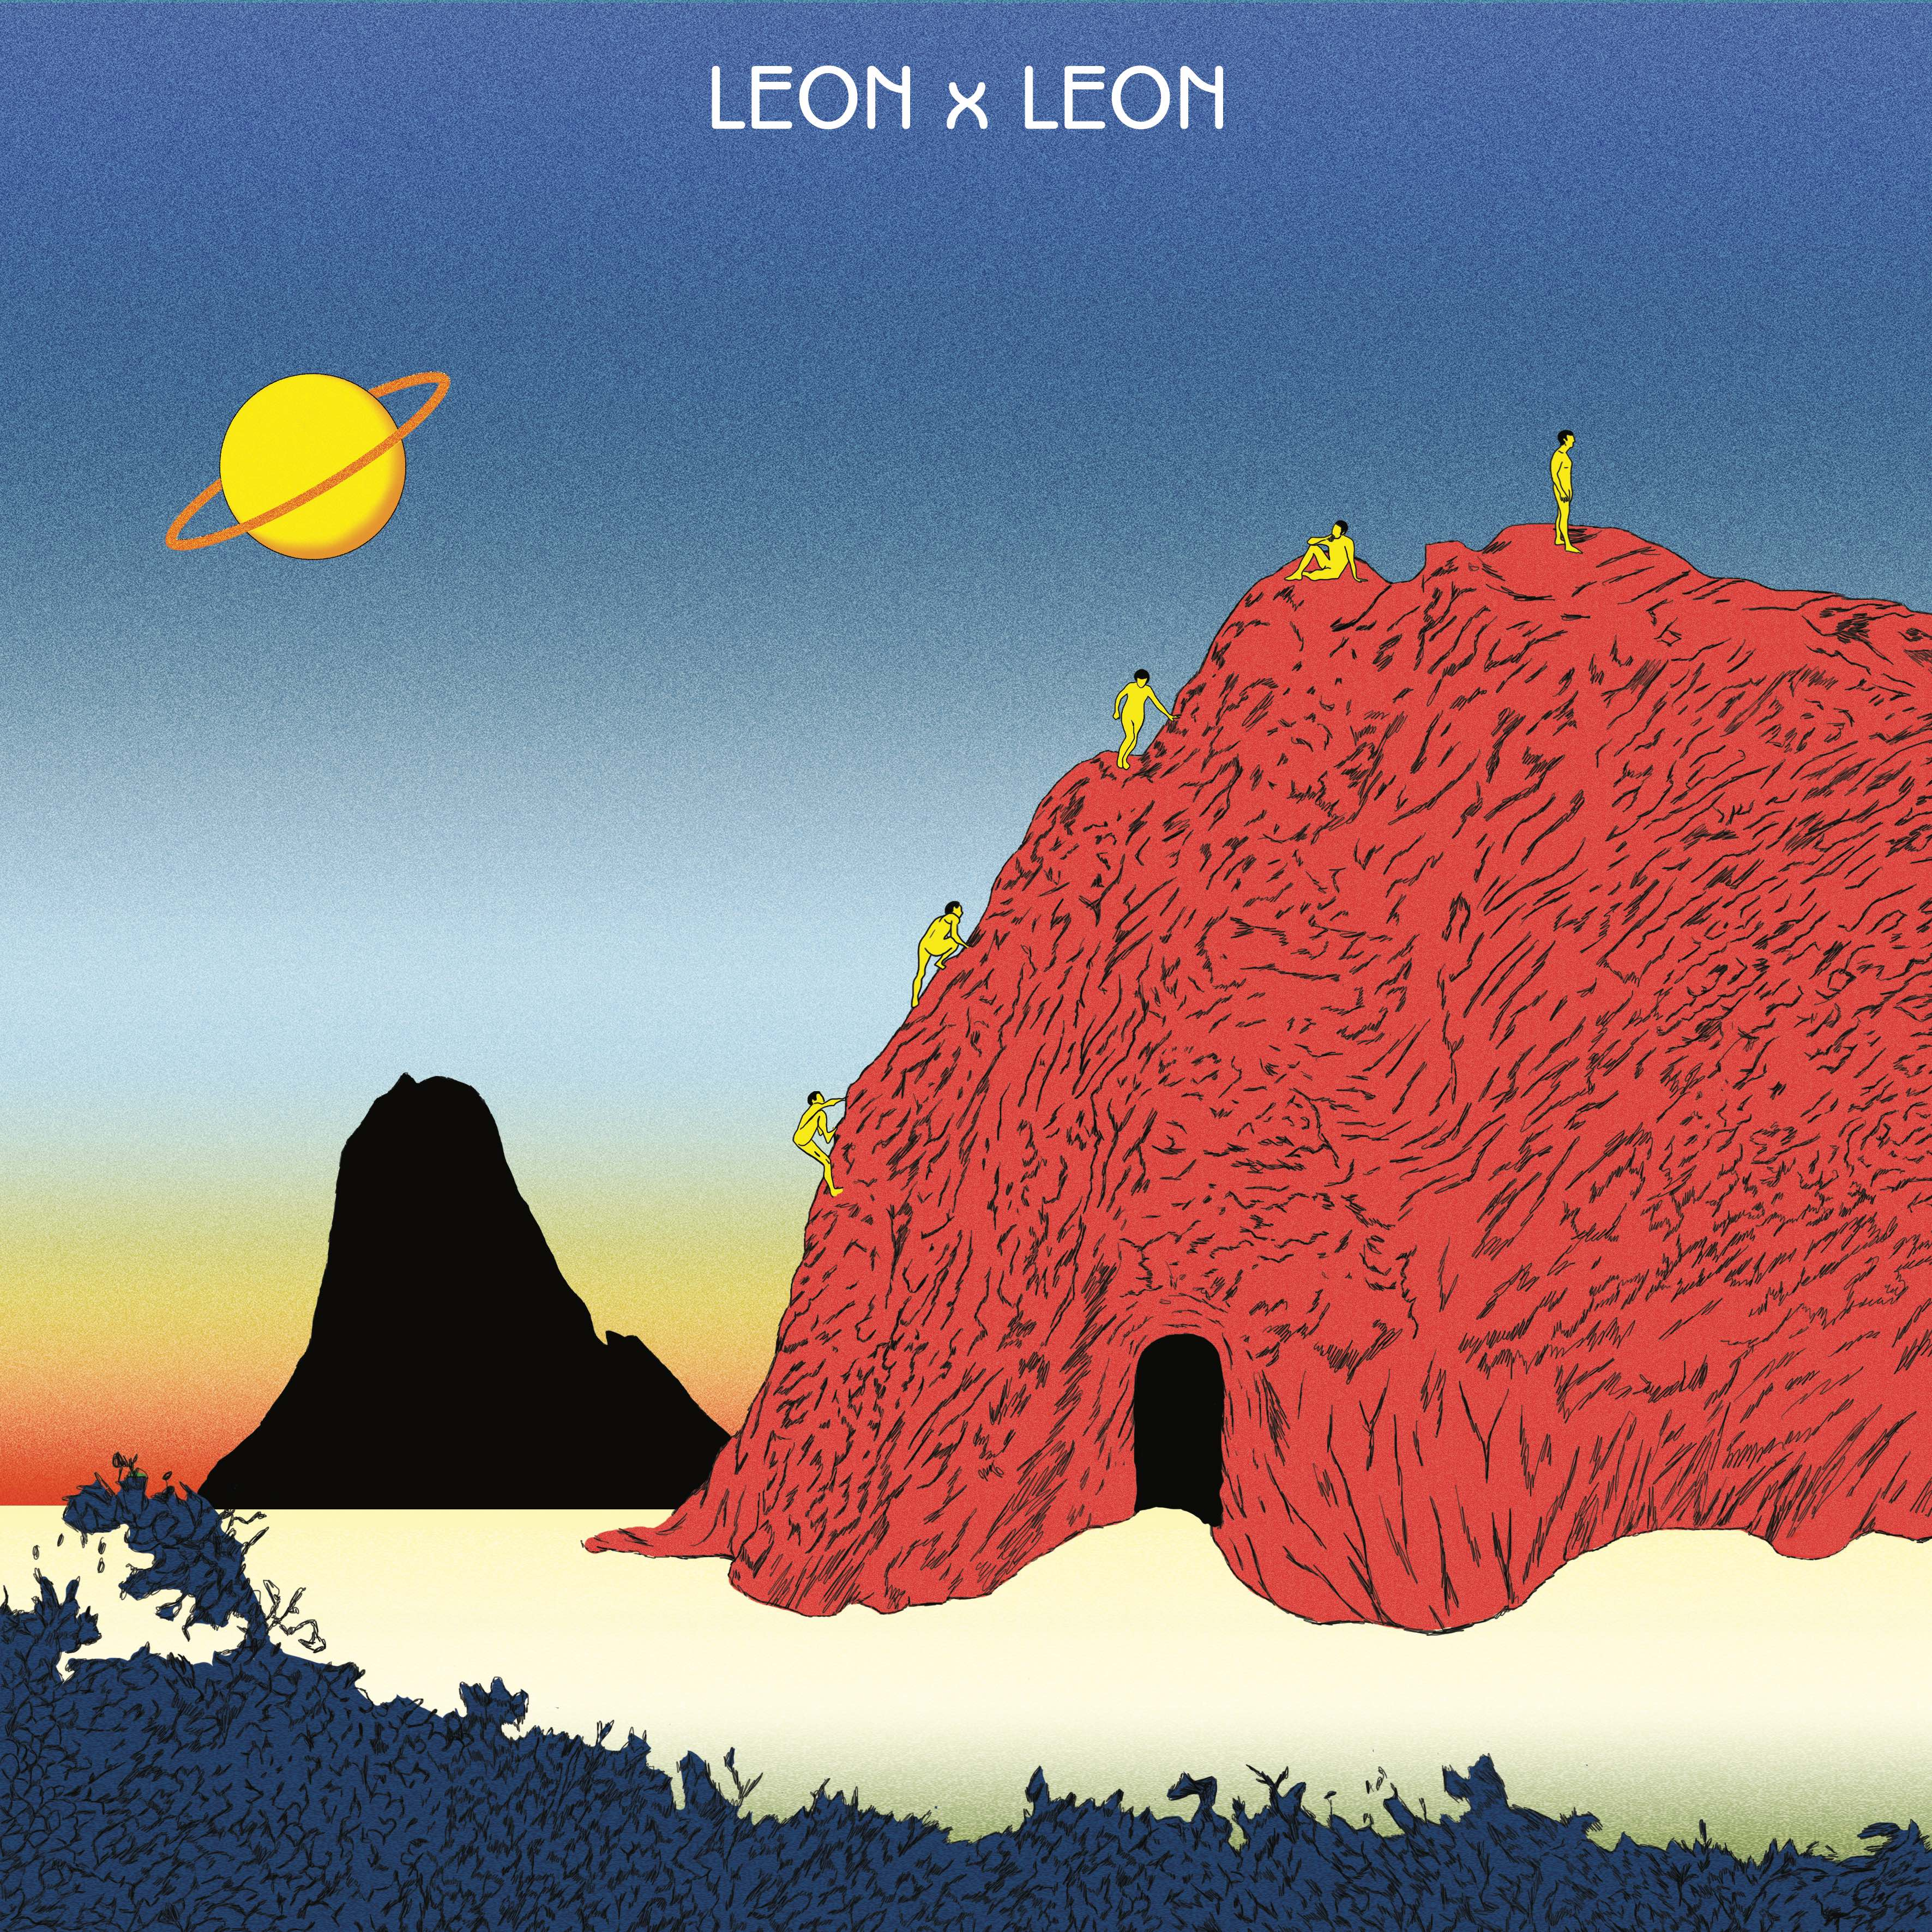 LeonxLeonfinal